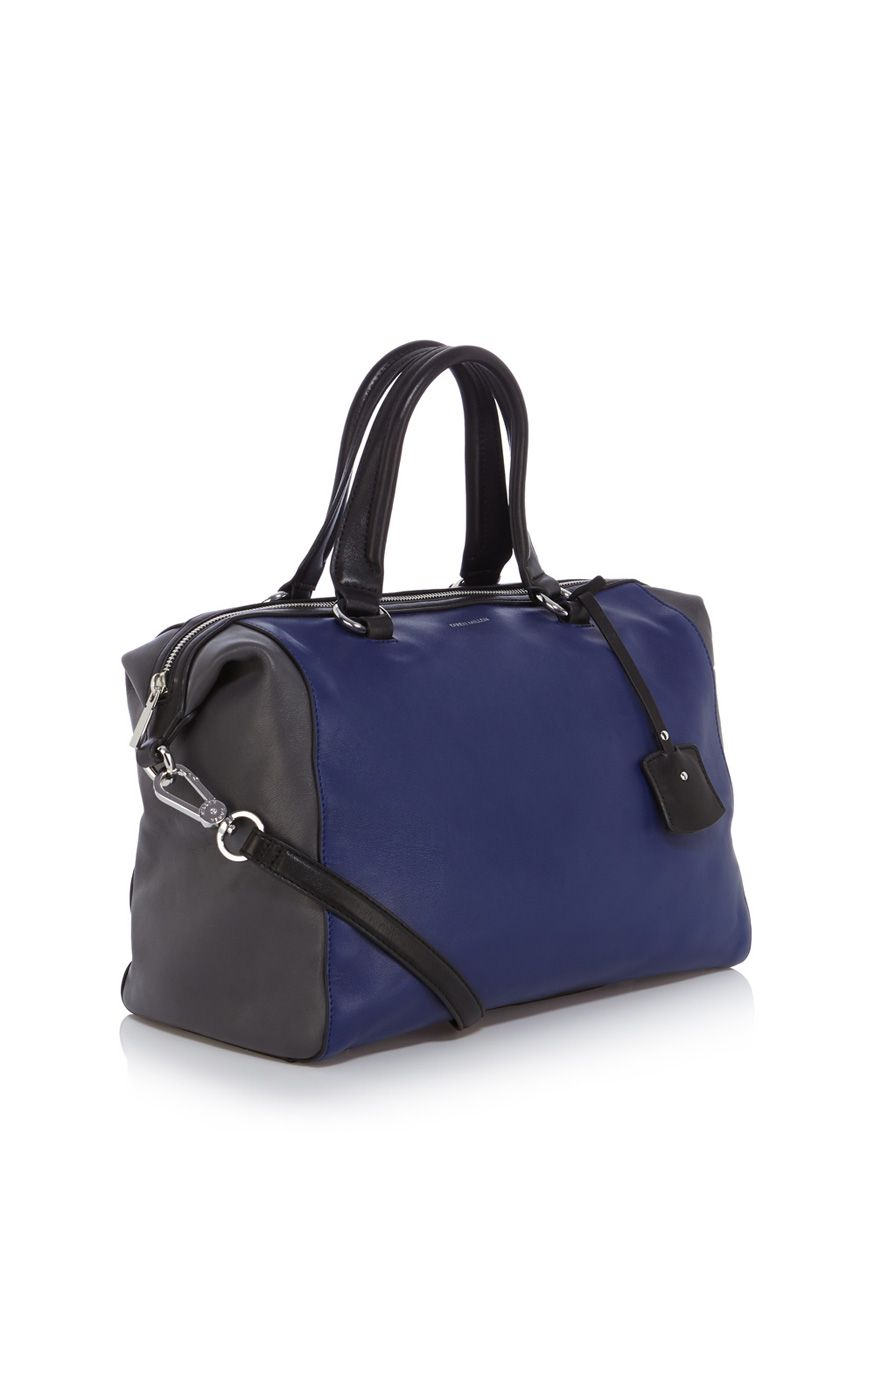 Karen Millen Colourblock Box Bag In Blue Lyst